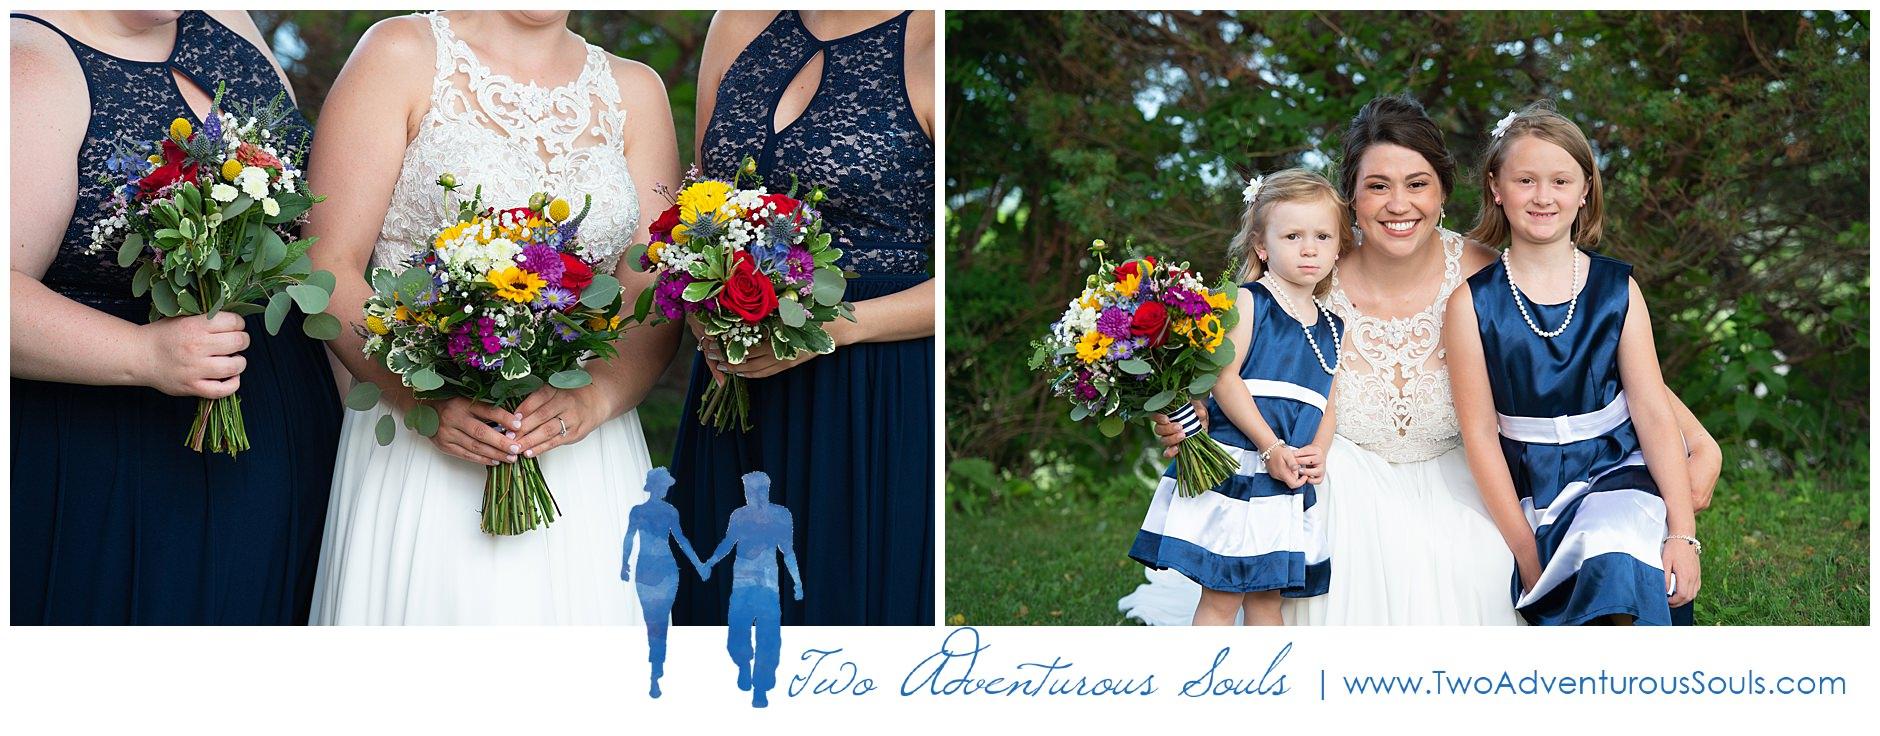 Maine Wedding Photographers, SMCC Wedding Photographers, Southern Maine Community College Wedding Photographers, Two Adventurous Souls-AshleyAaron_0016.jpg